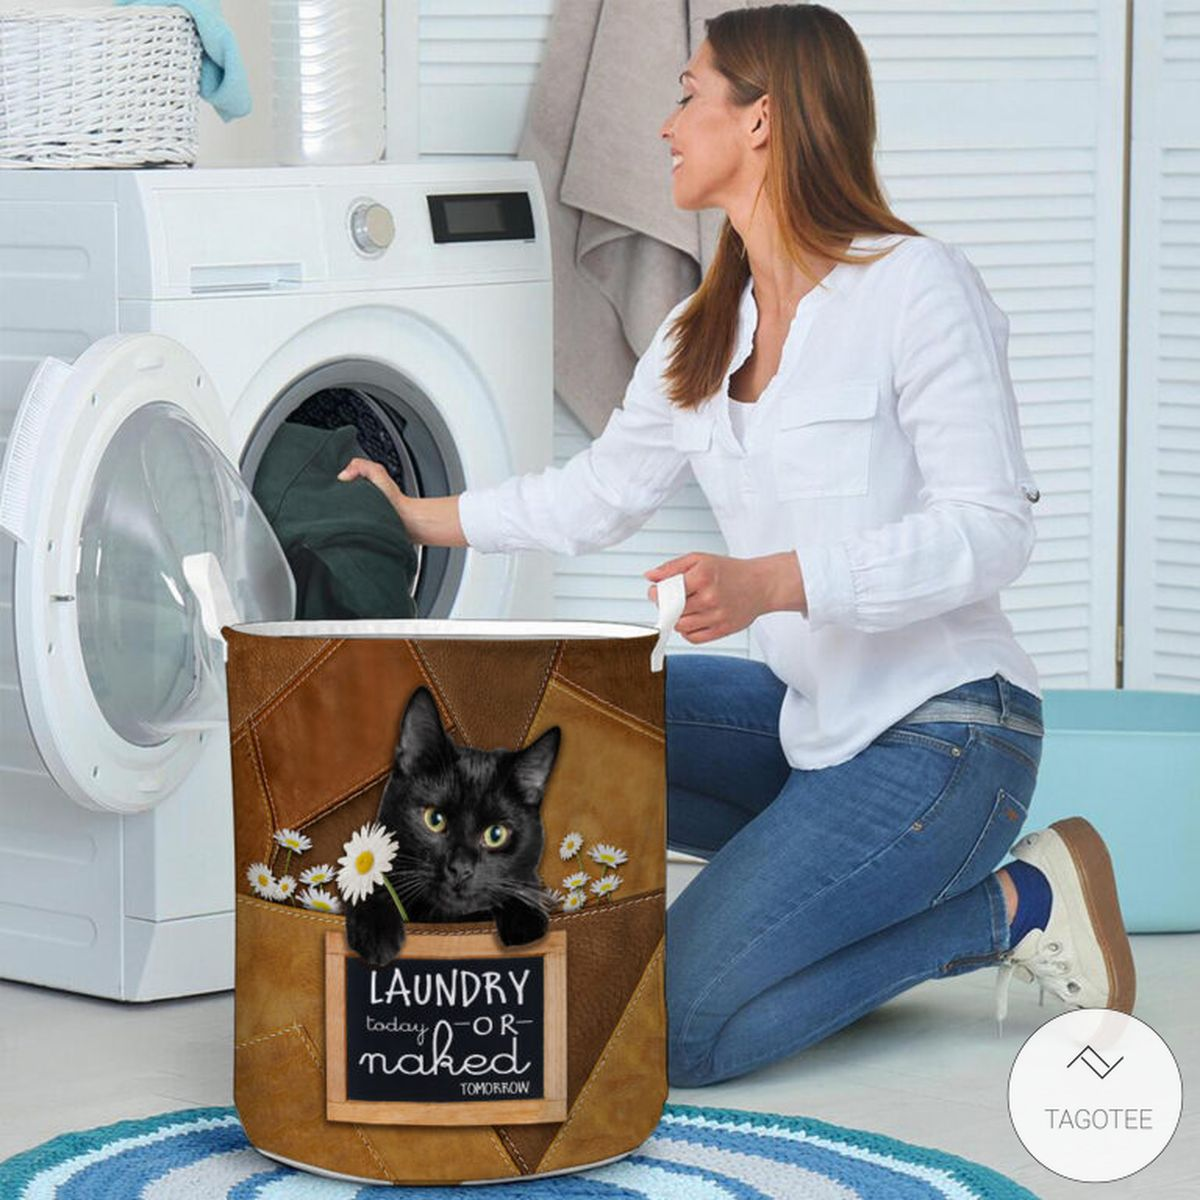 Black Cat Laundry Today Or Naked Tomorrow Laundry Basketc